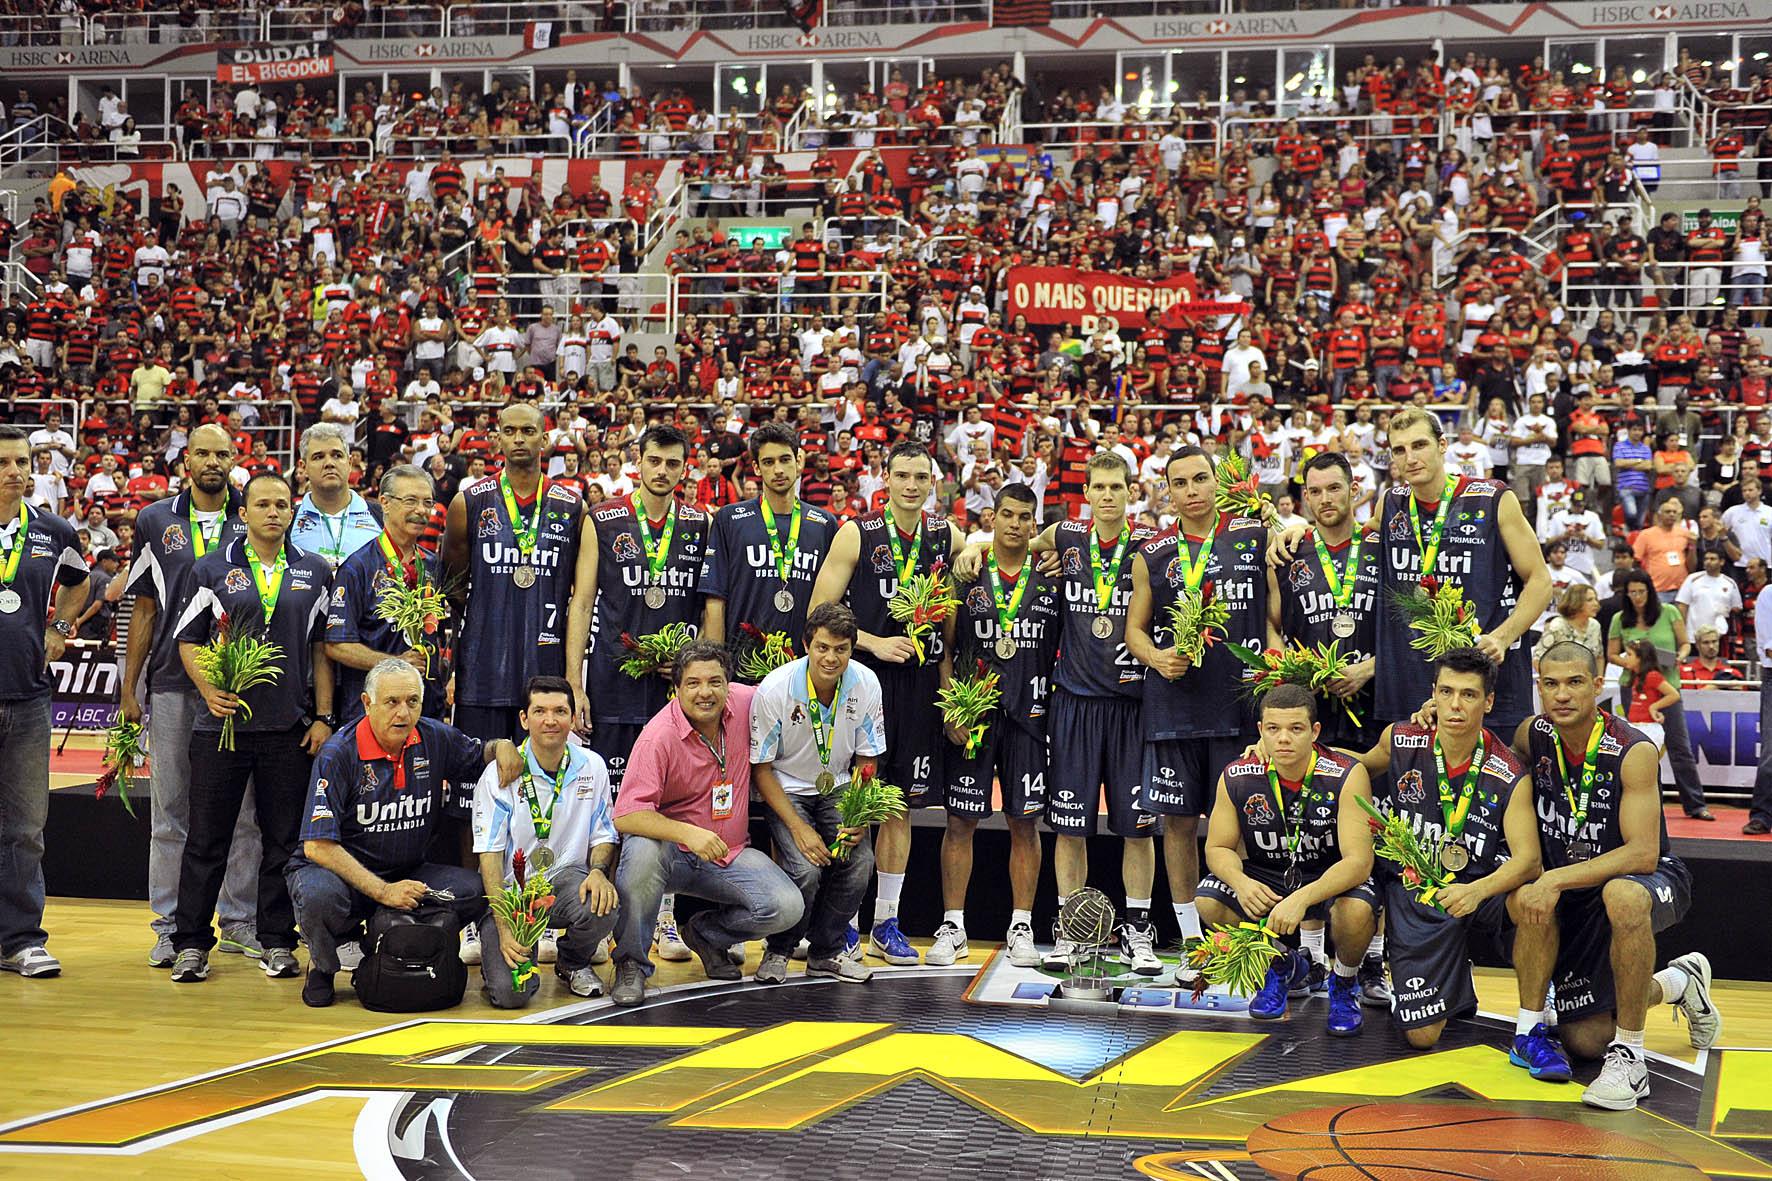 Uberlândia, vice-campeão do NBB